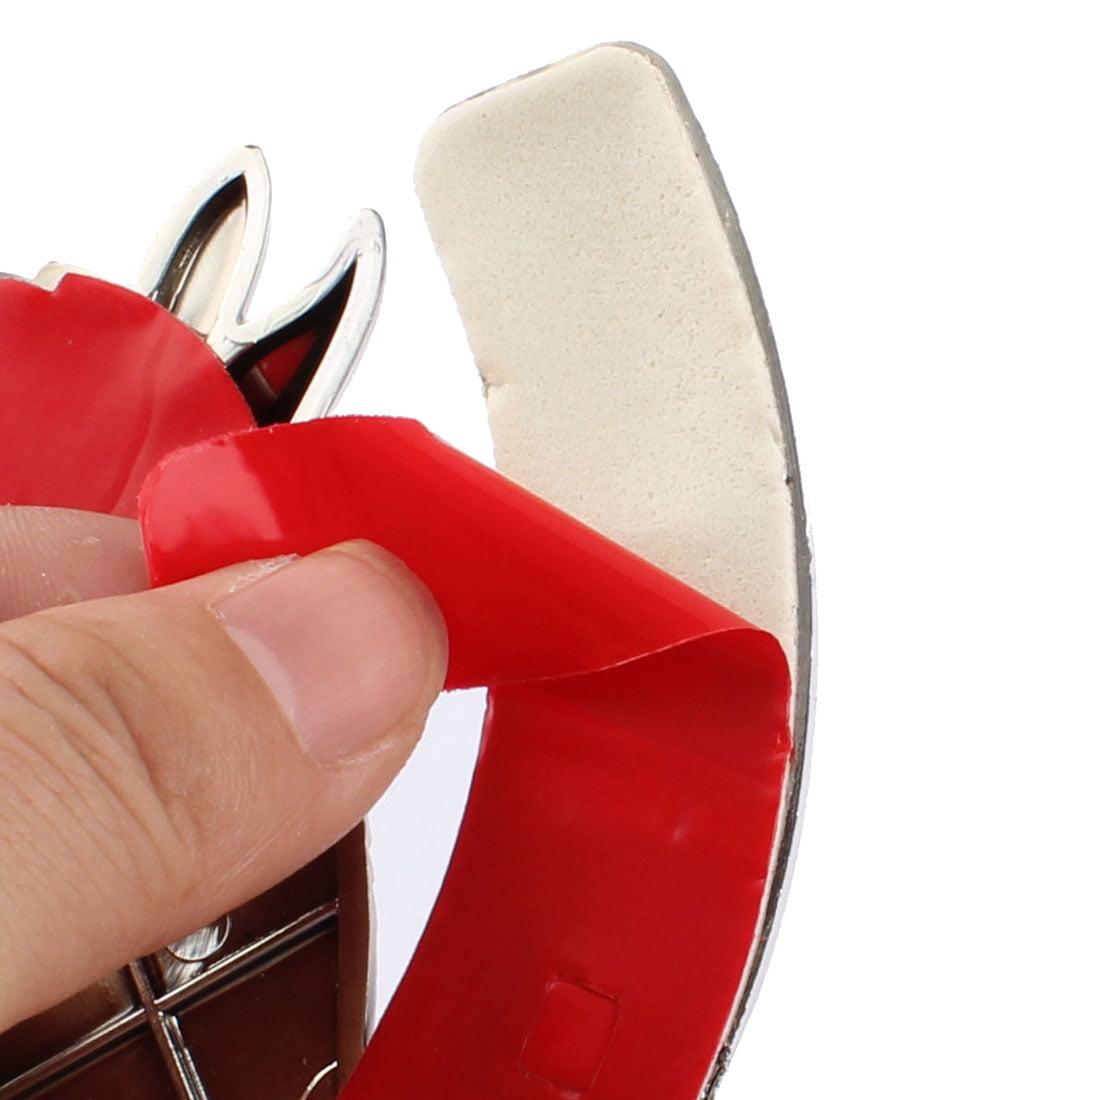 Vehicles Auto Car Plastic Hose Head Design Decal Sticker Silver Tone - image 1 of 2